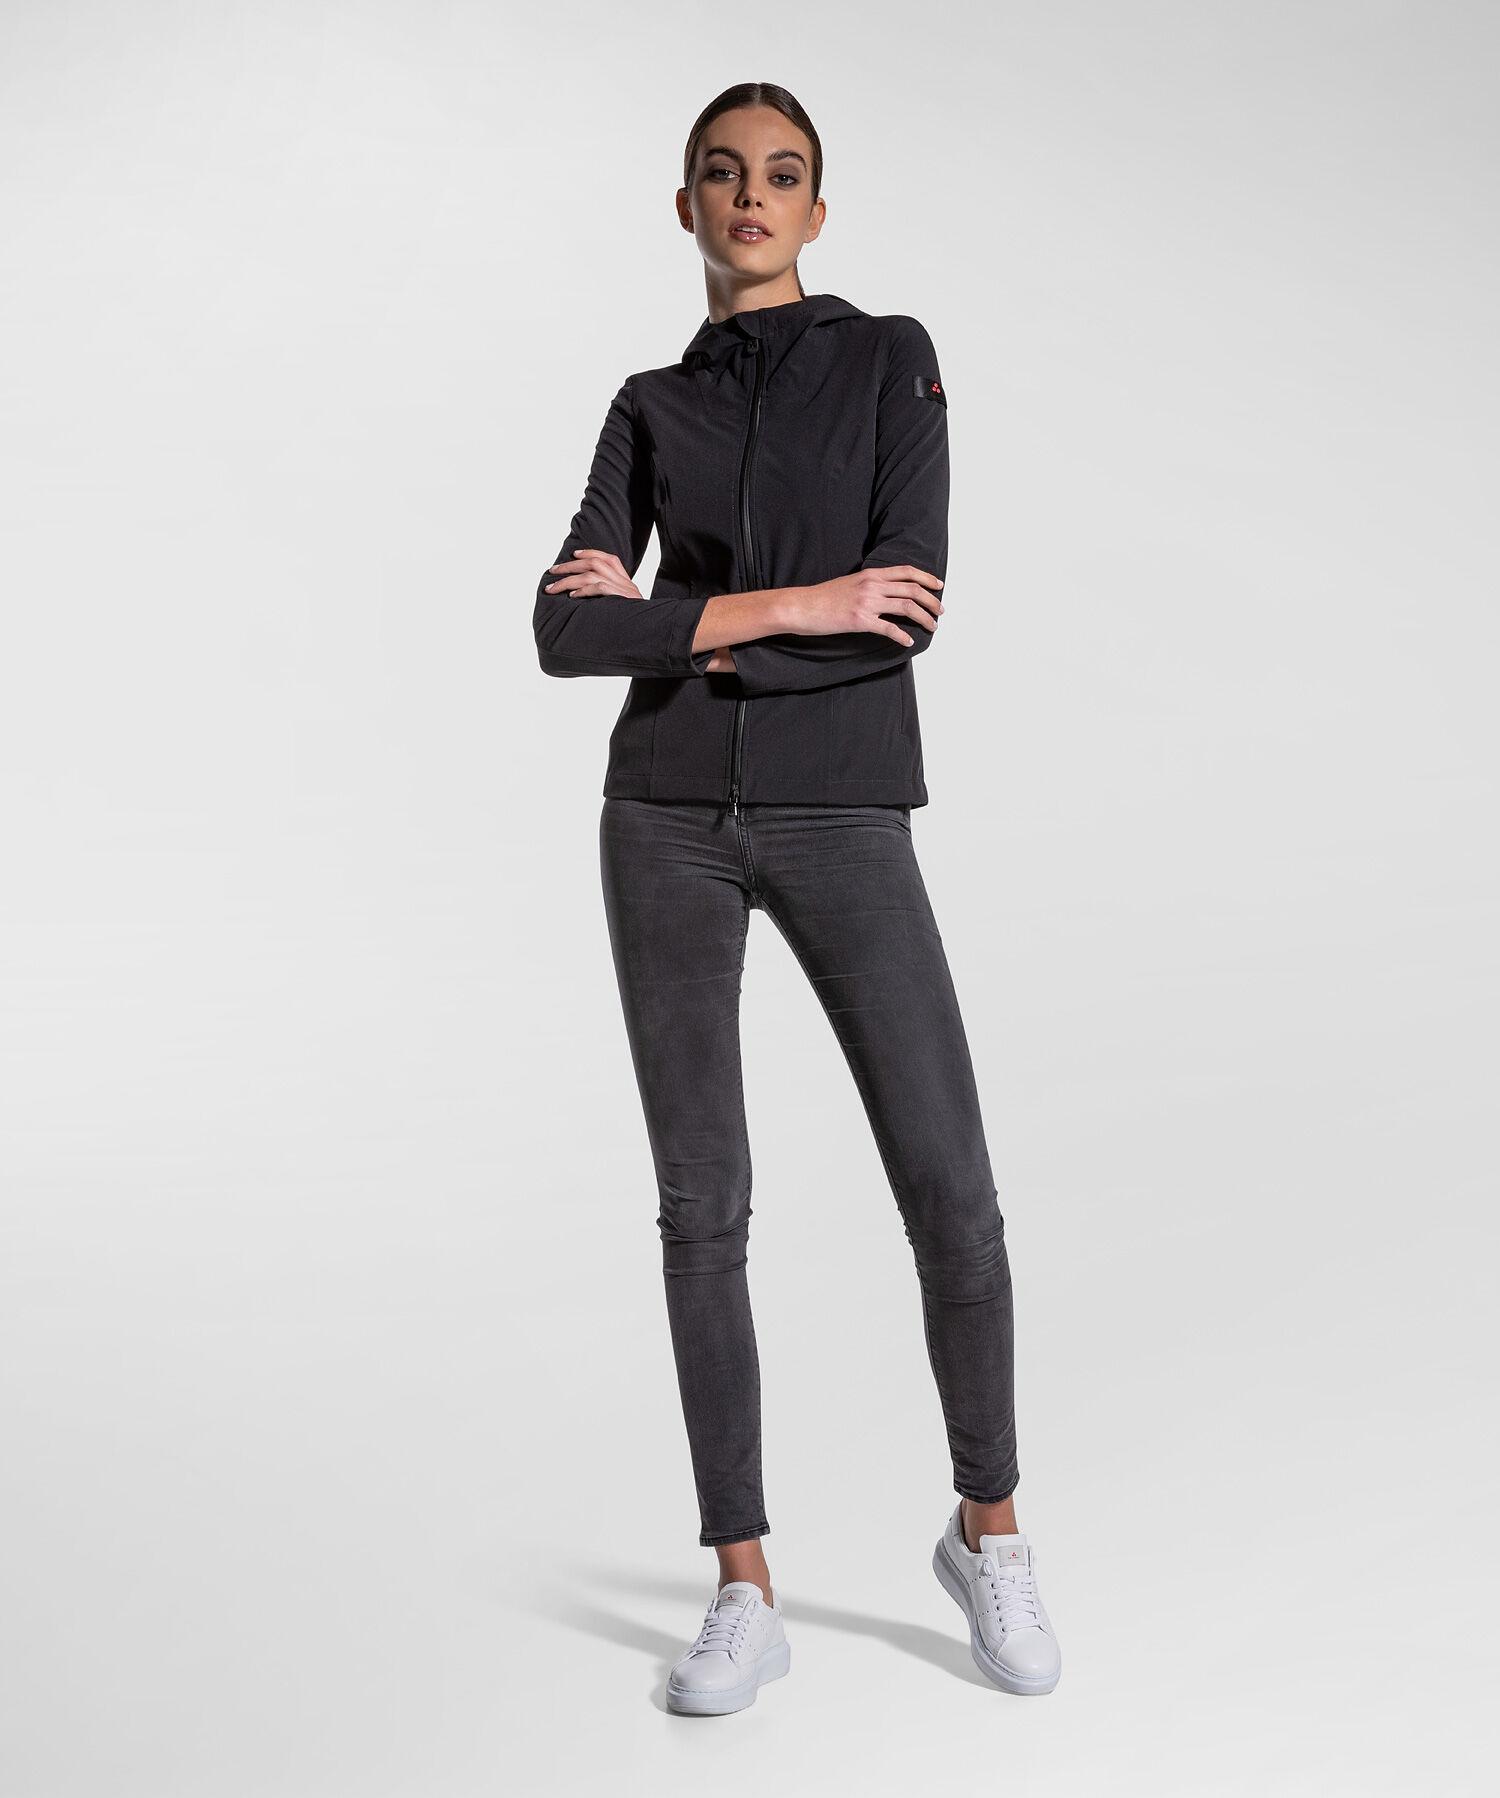 Bonded Fabric Sweatshirt - Peuterey